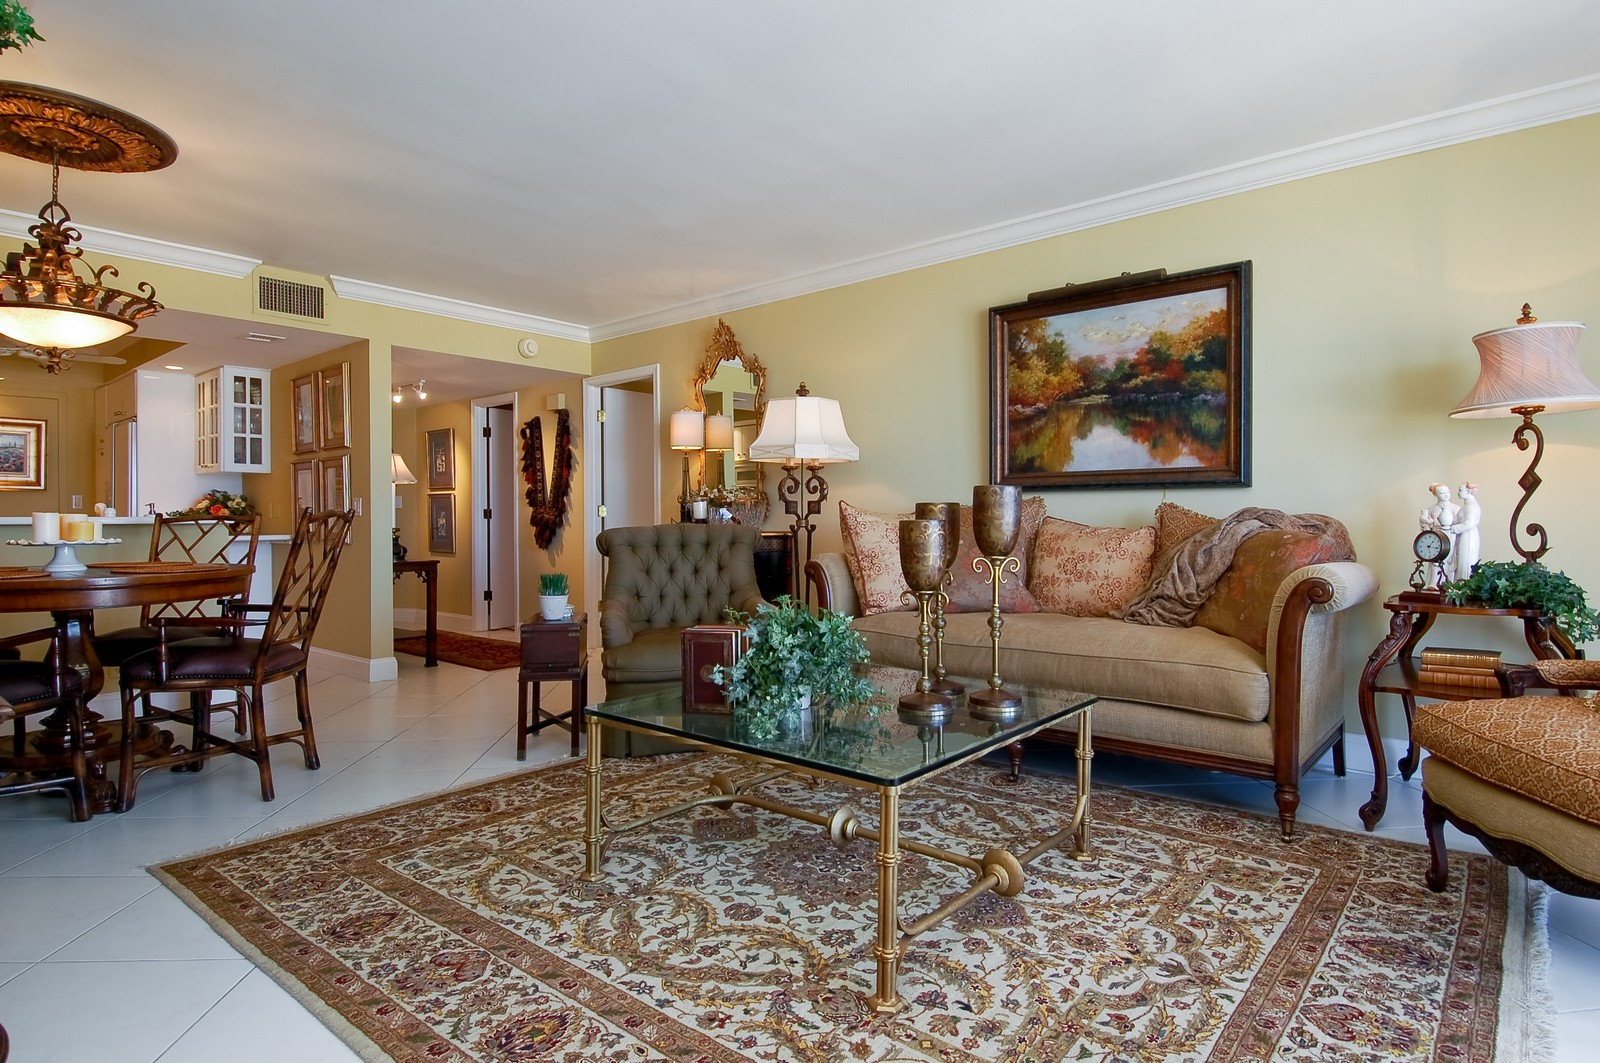 Real Estate Photography - 2200 S Ocean Ln, 1003, Fort Lauderdale, FL, 33316 - Living Room / Dining Room